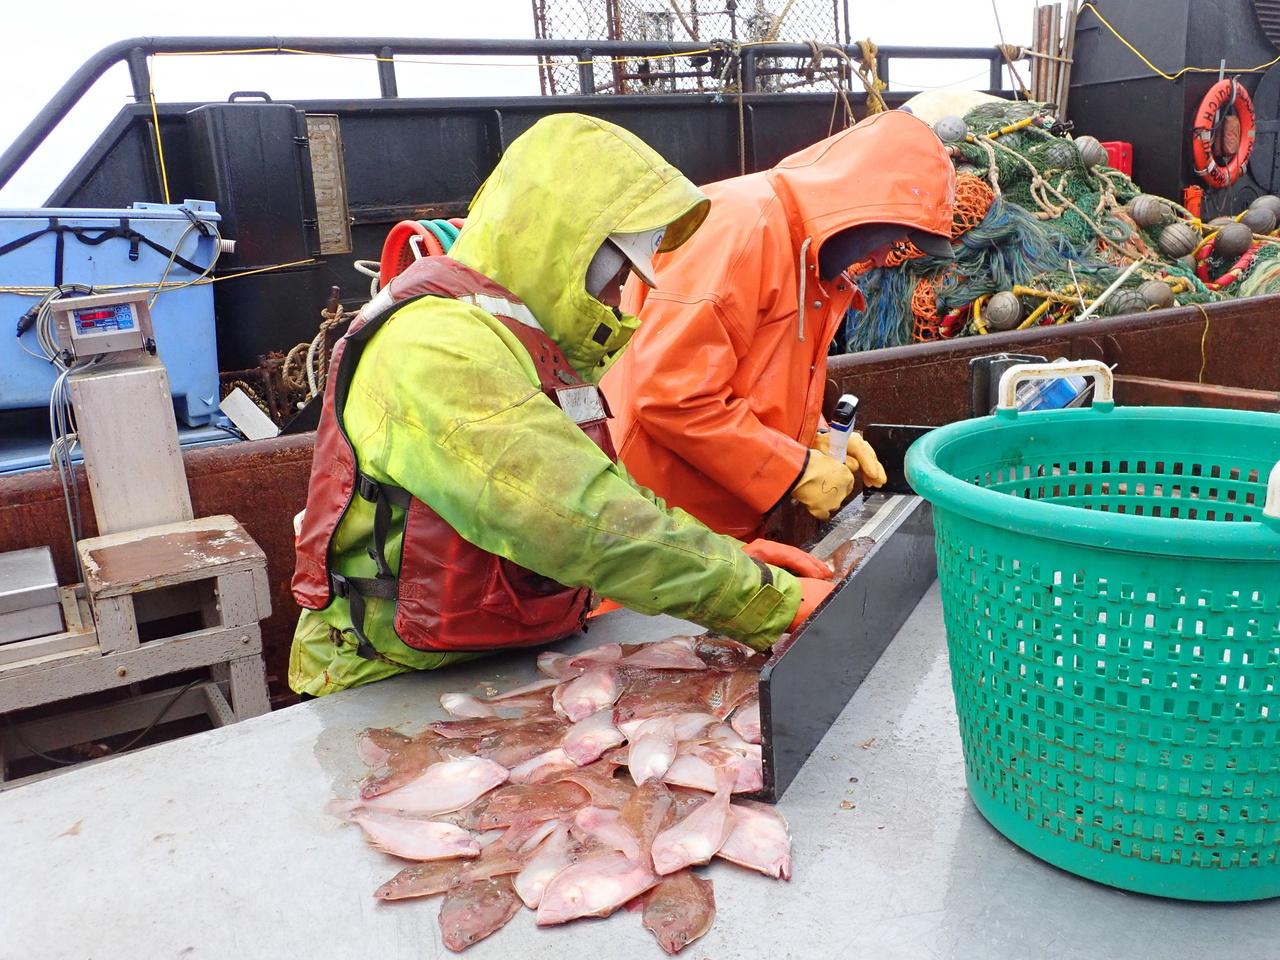 Adult-GF-Crab-Bottom-Dwelling-Species_Survey-SEBS_Continental-Shelf_3.JPG